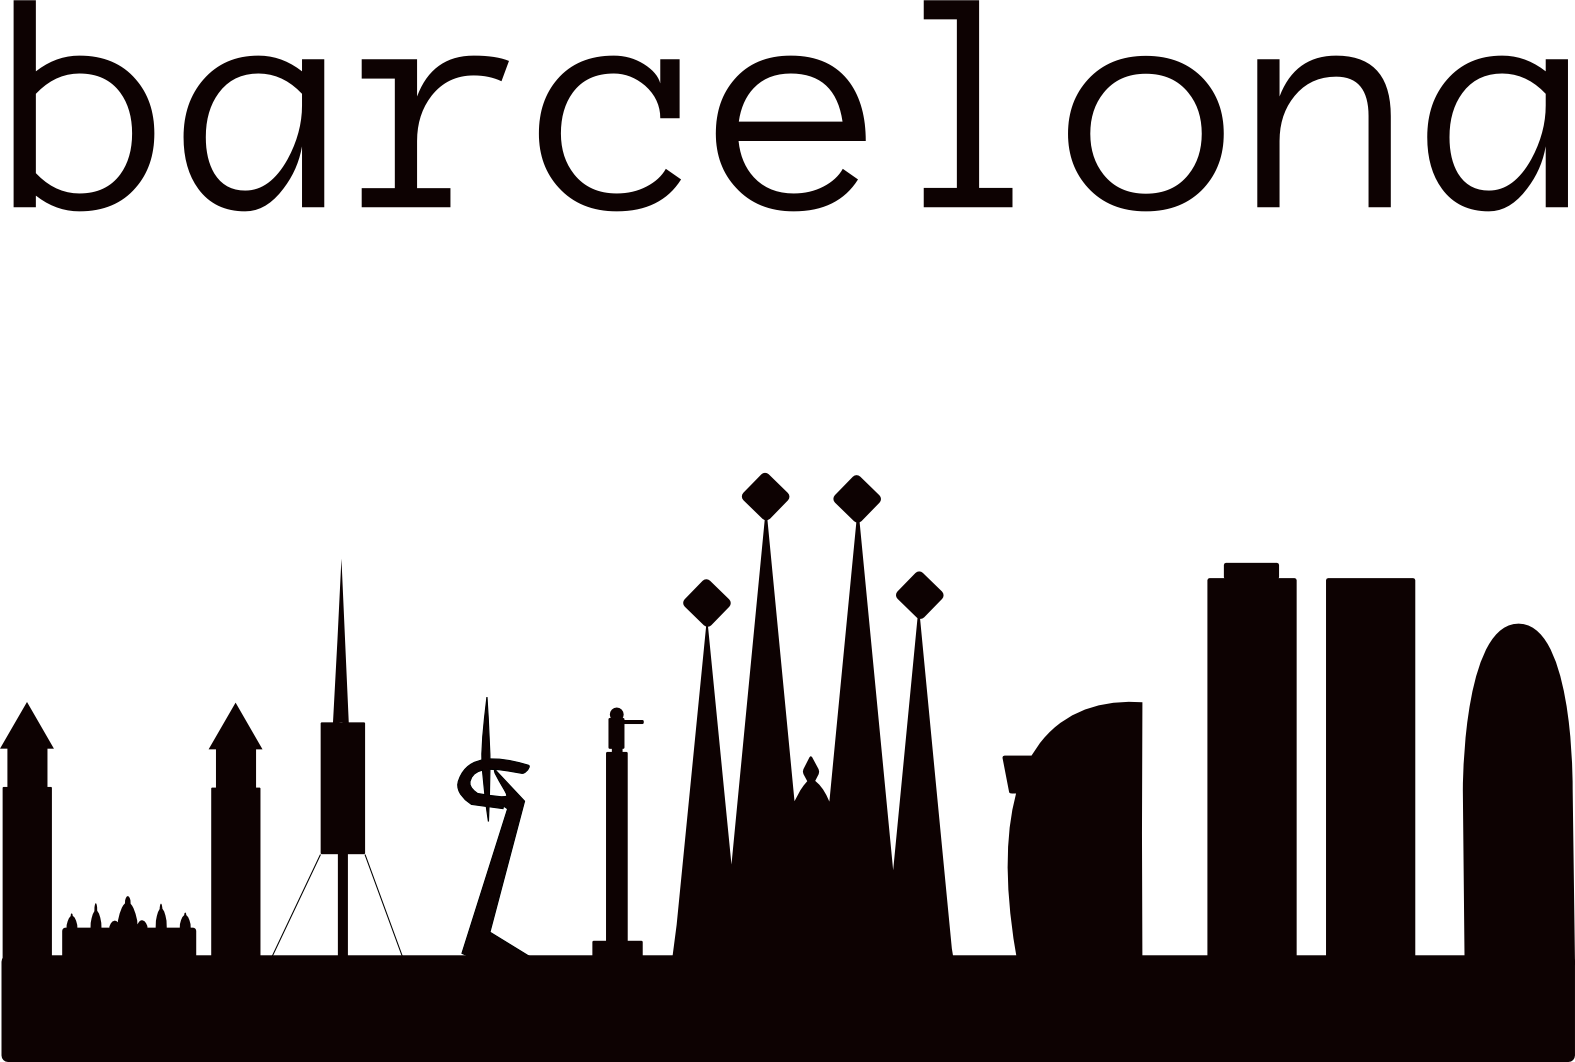 Irish clipart landmarks. Barcelona skyline inspired by